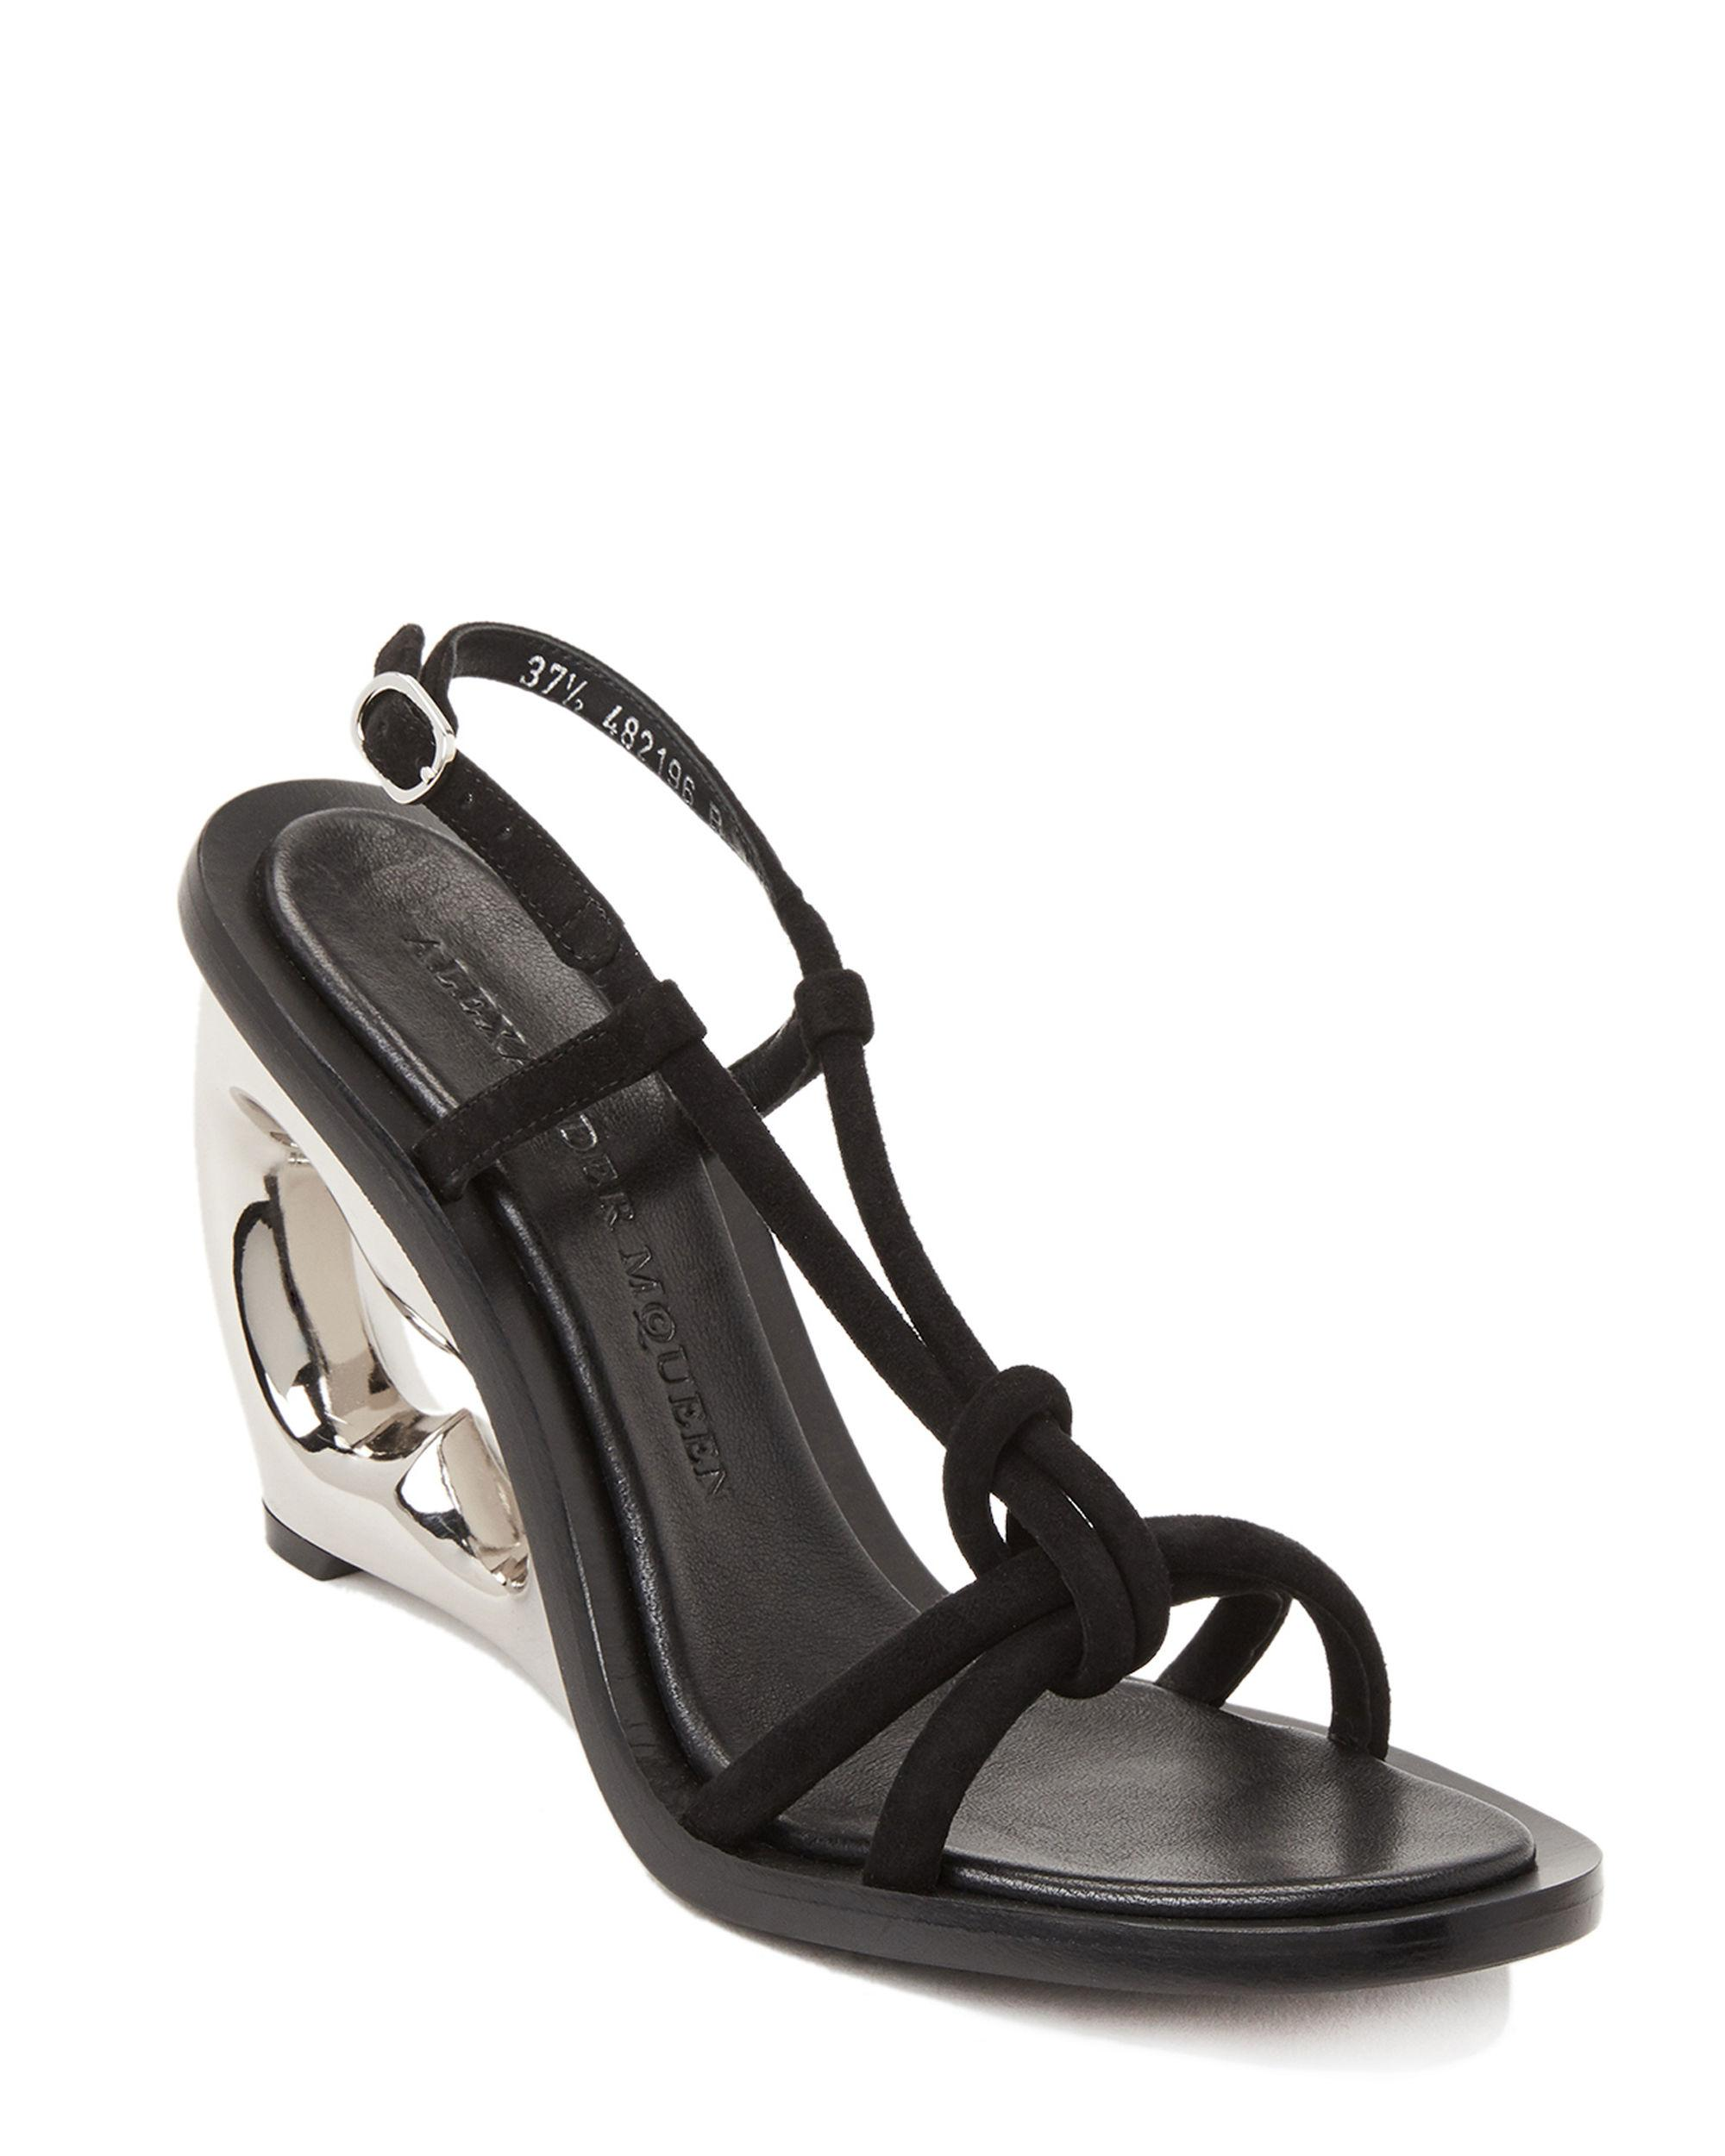 79d7e6af84 Alexander McQueen. Women's Black Strappy Suede Structured Wedge Sandals